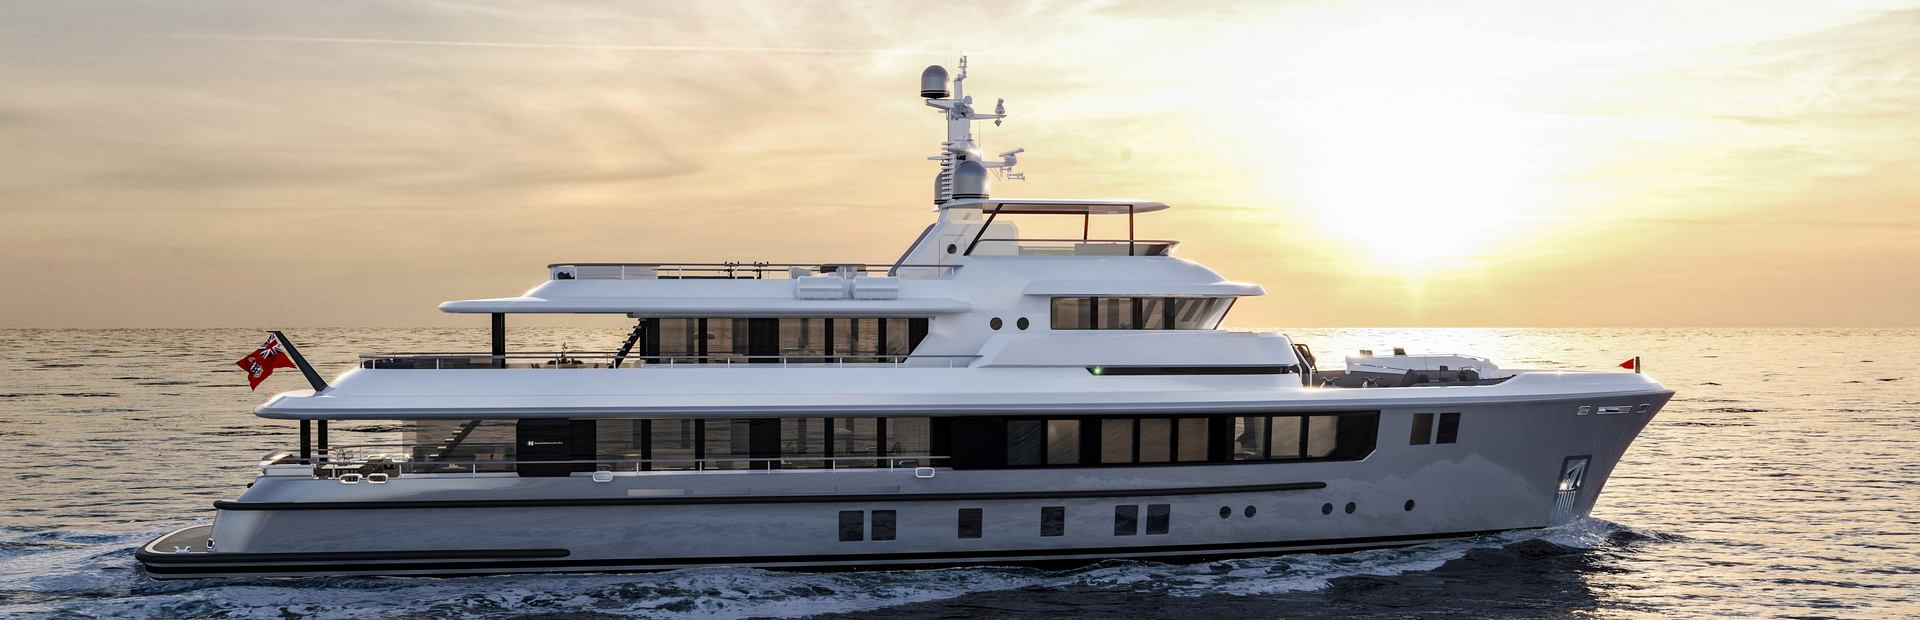 Nordhavn 148 Yacht Charter